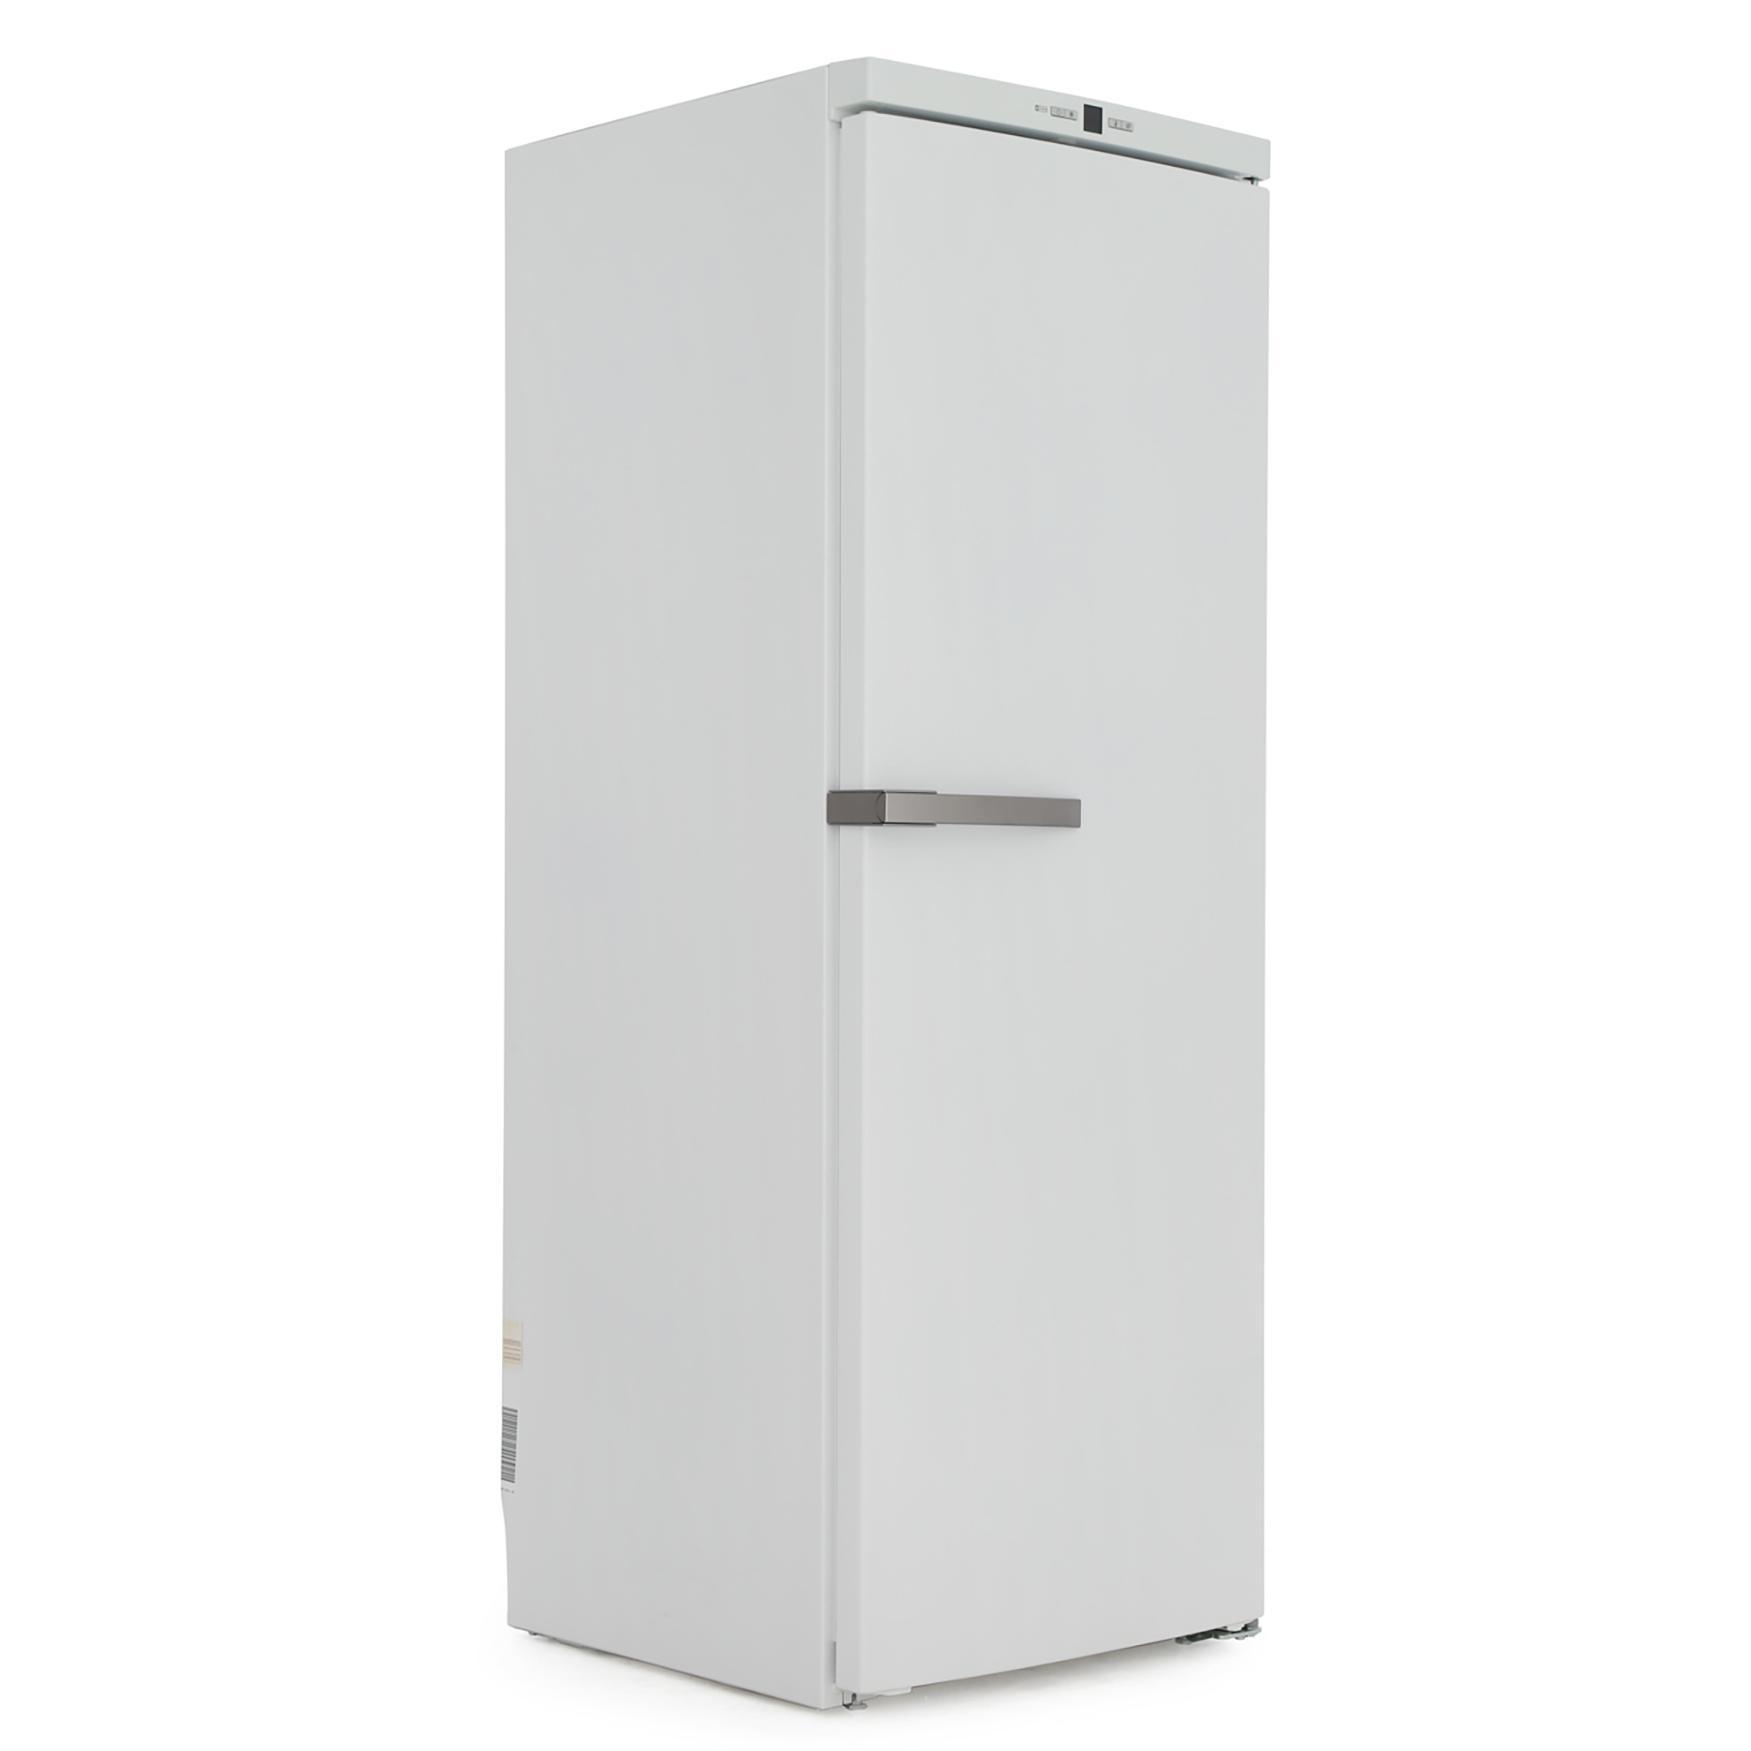 Miele FN12621S Tall Freezer